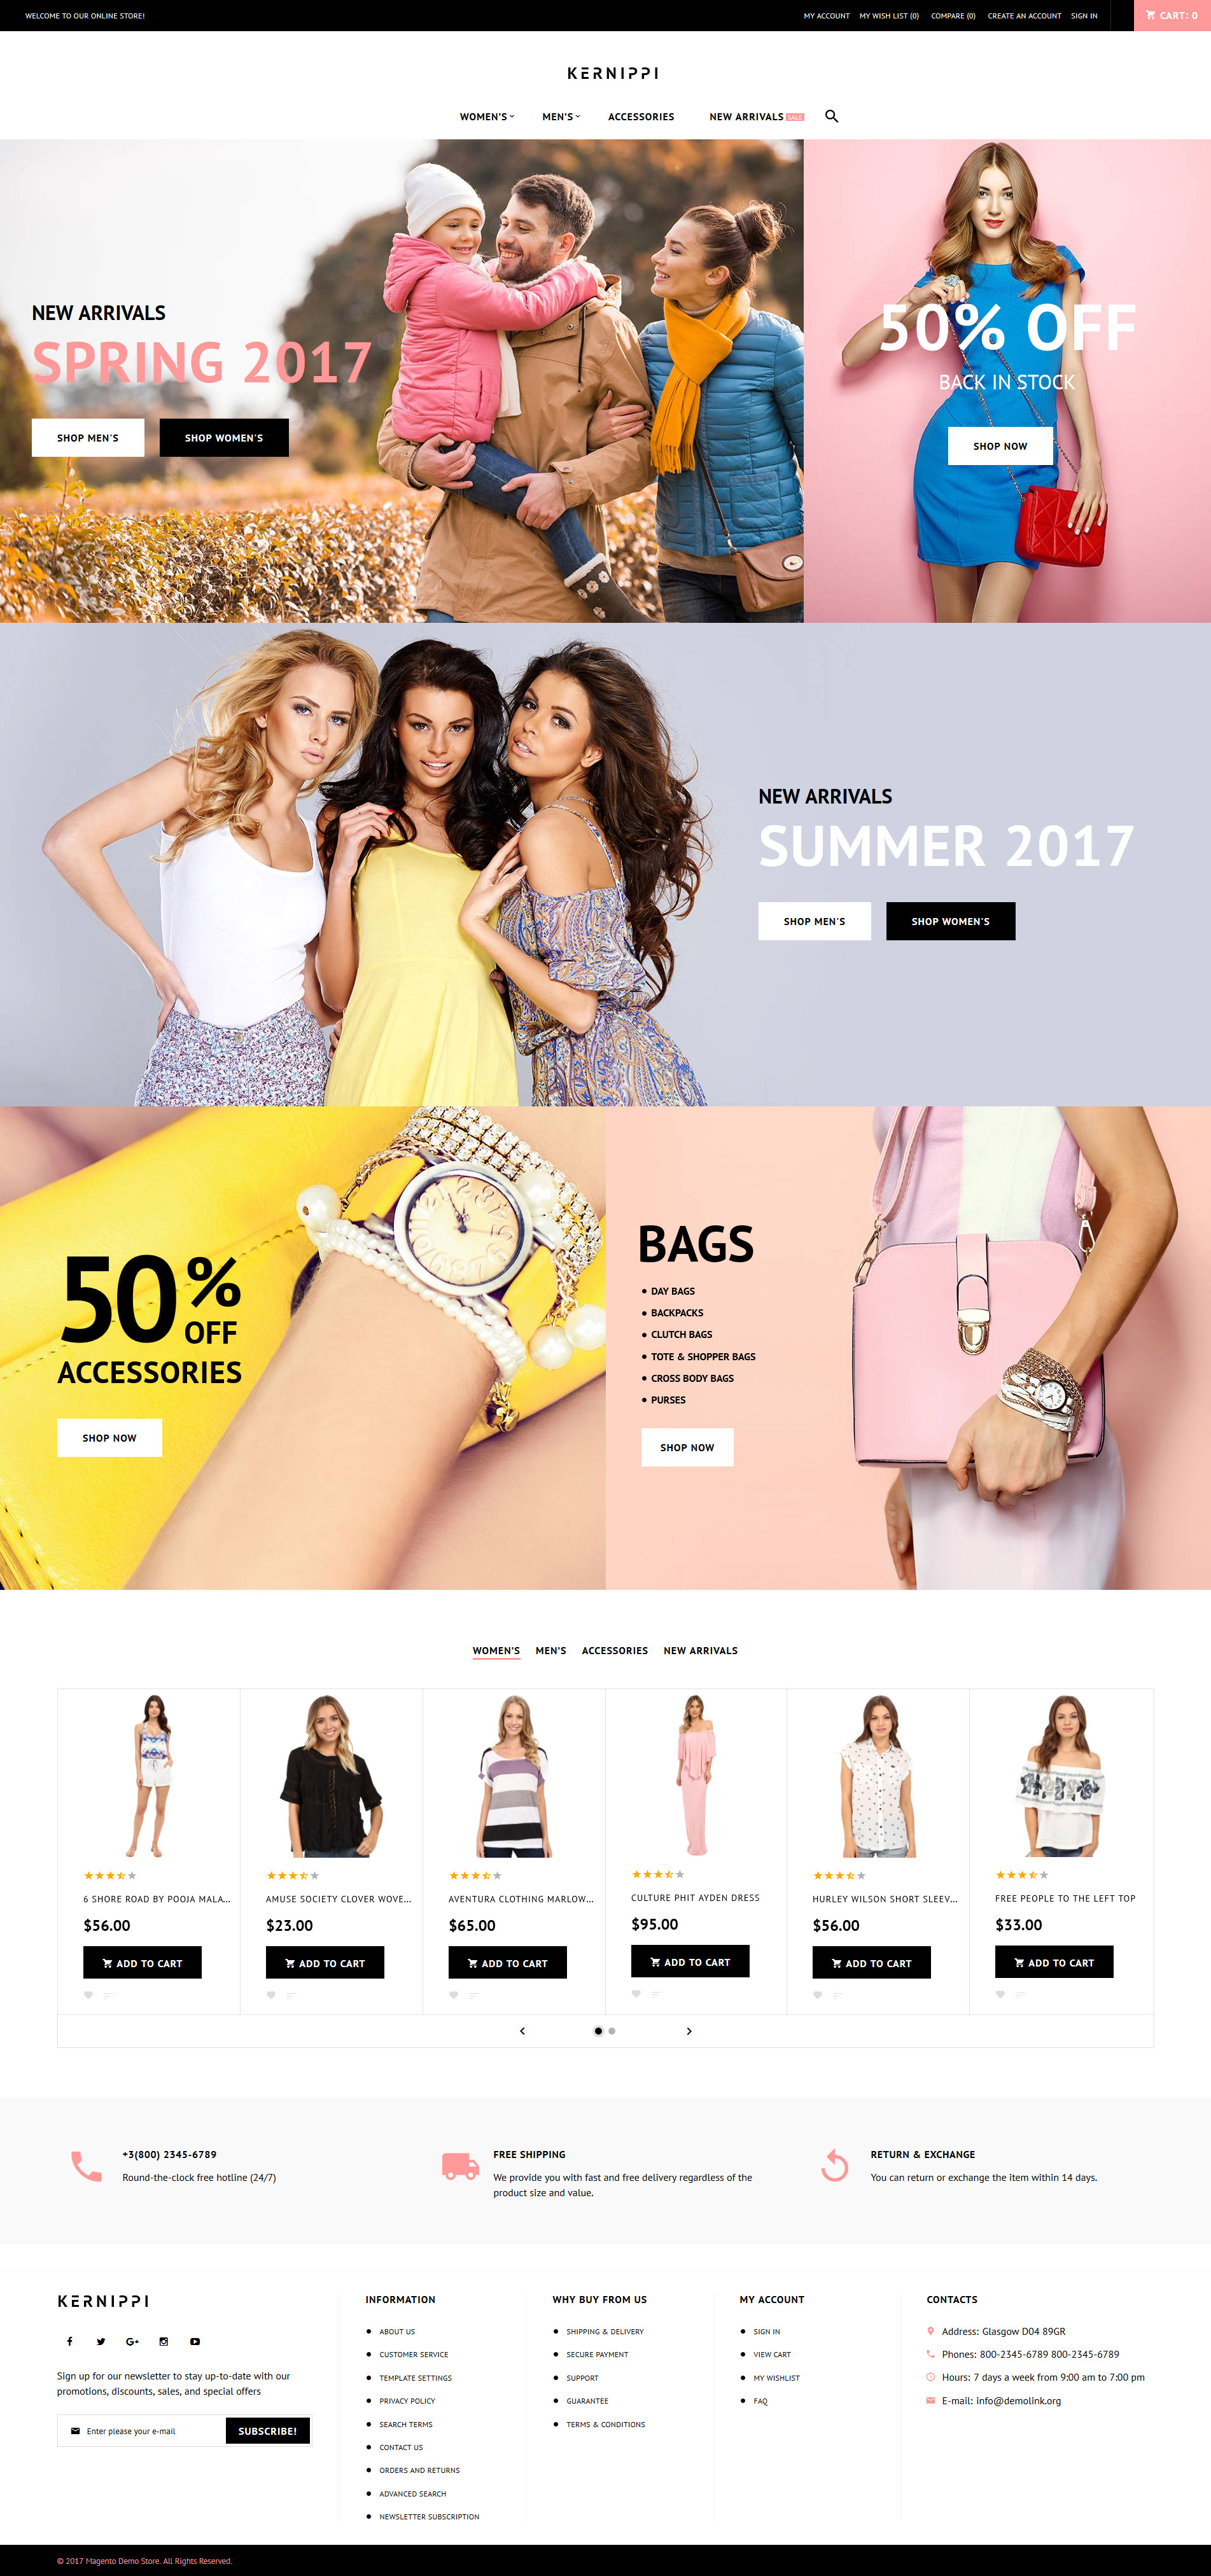 Kernippi - Apparel Store Magento Theme - screenshot